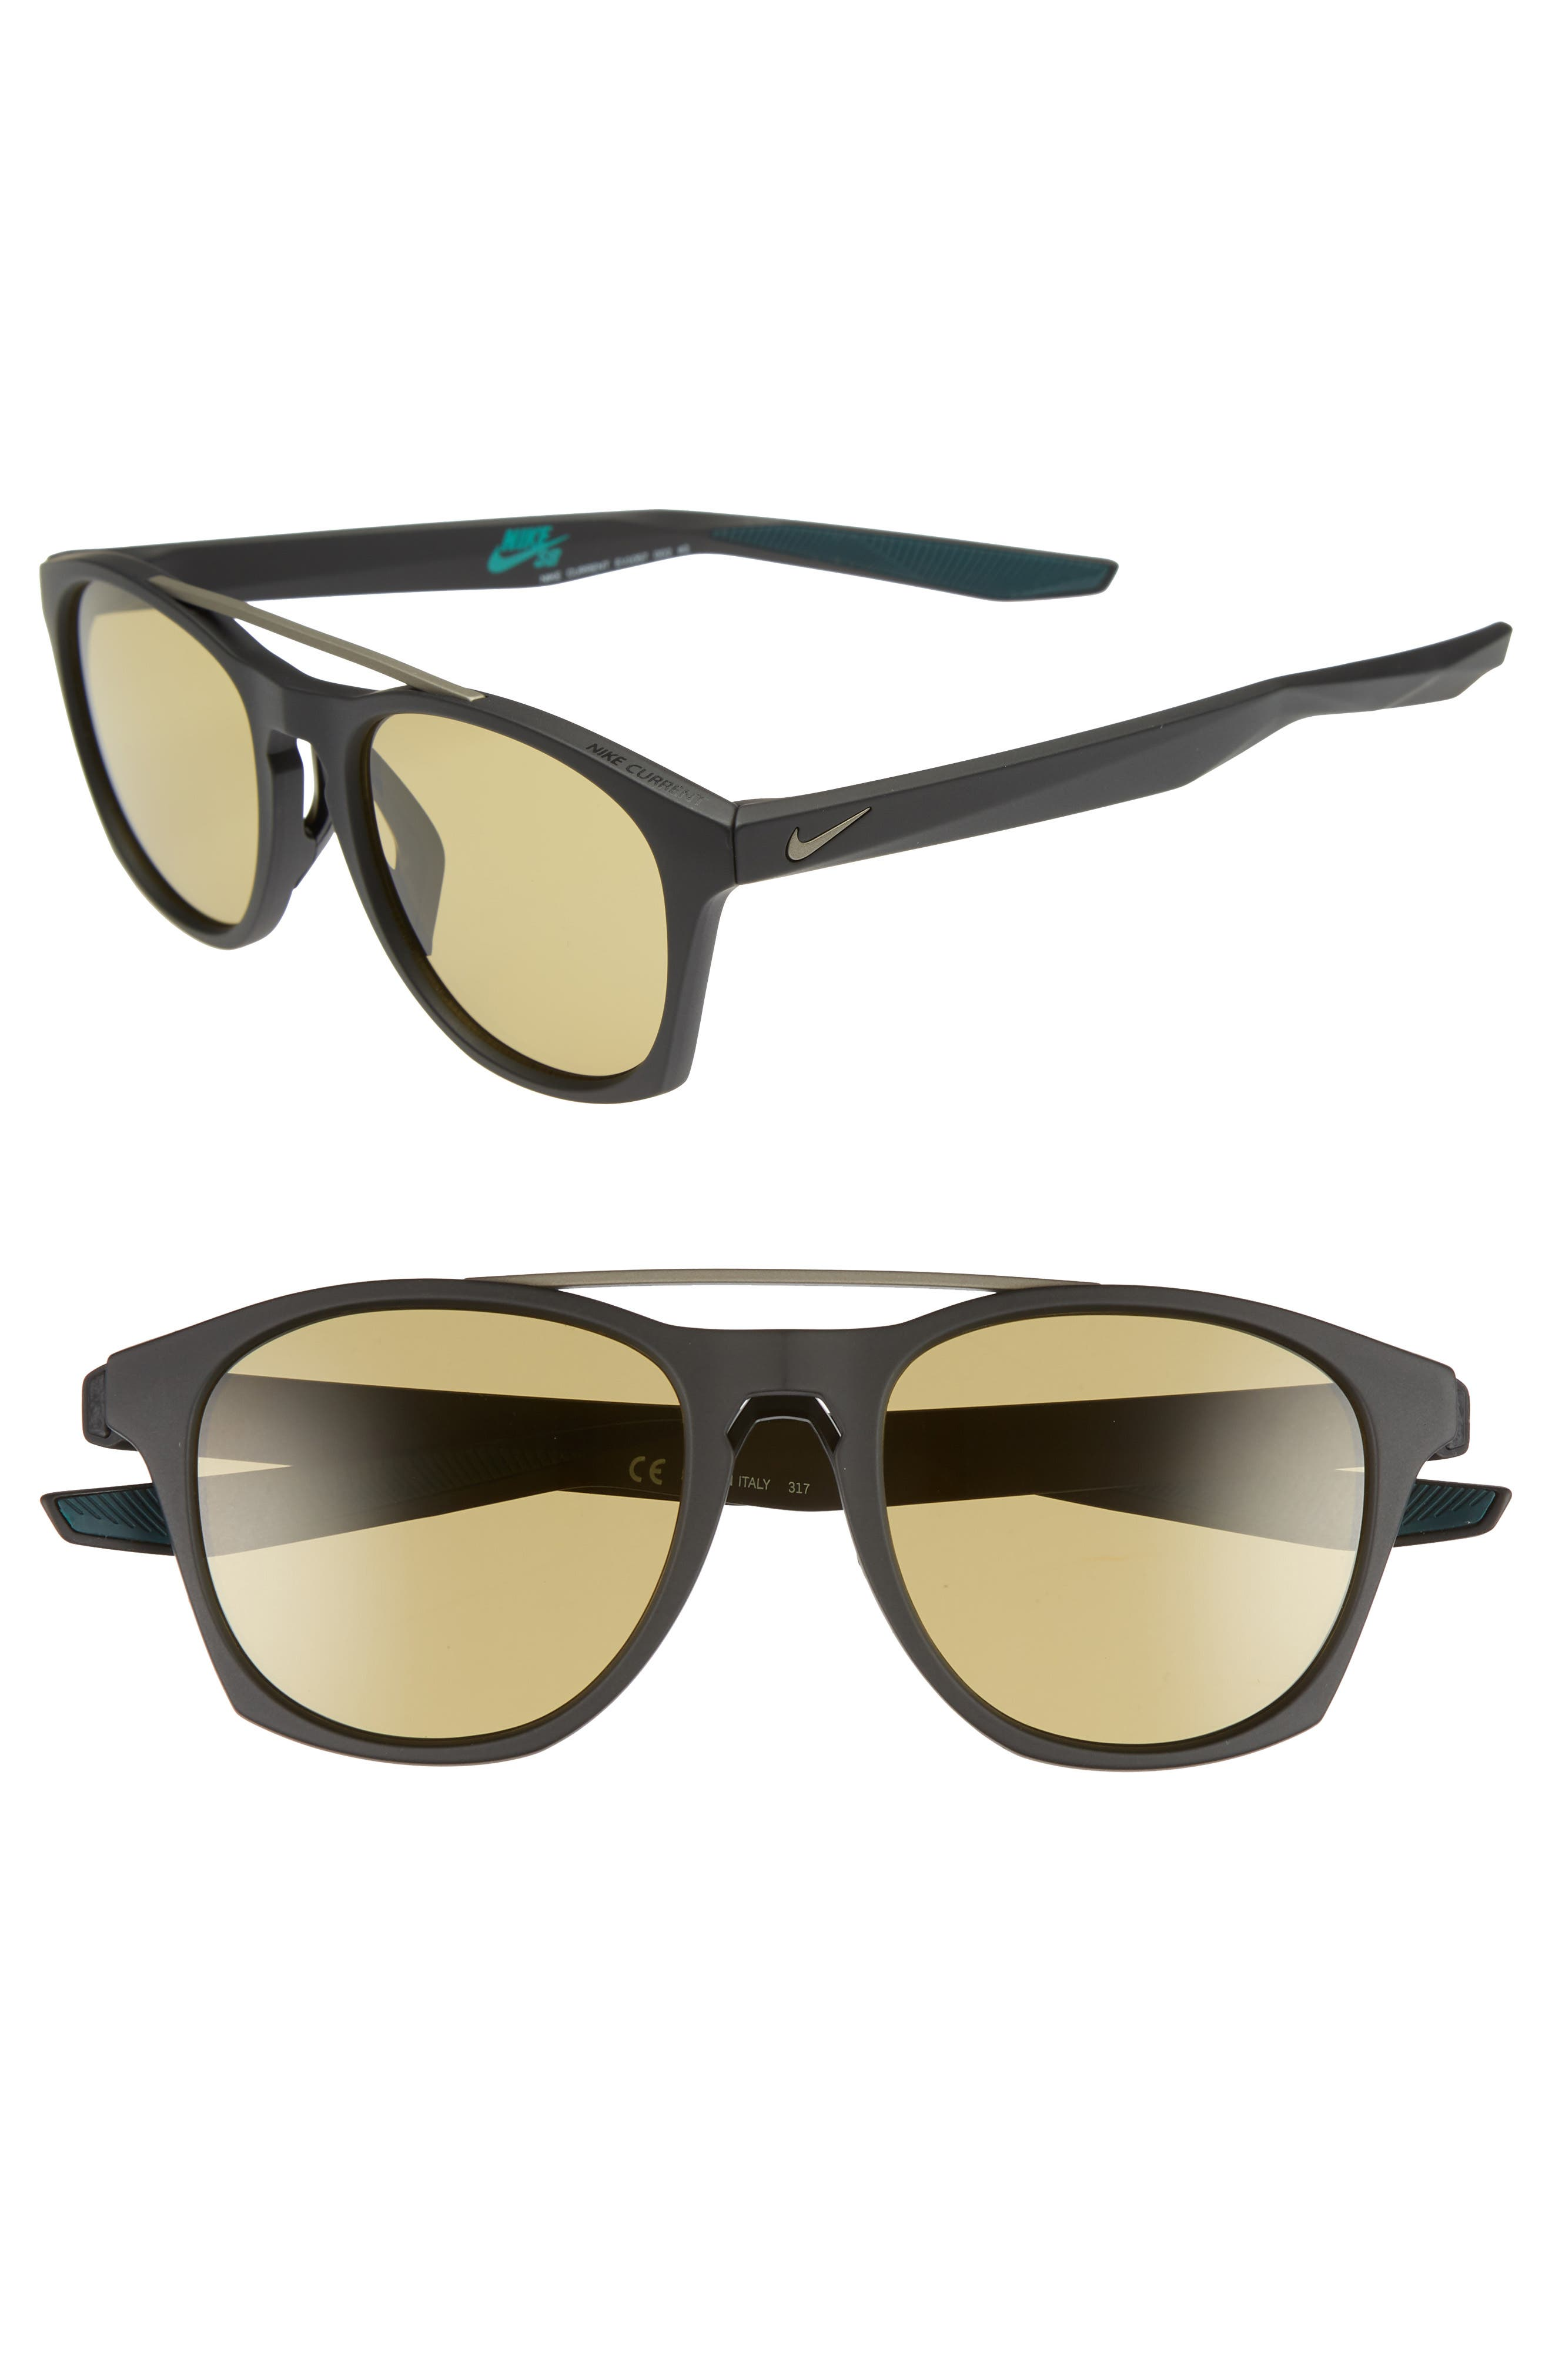 Nike Current 51Mm Sunglasses - Matte Black/ Pewter/ Amber